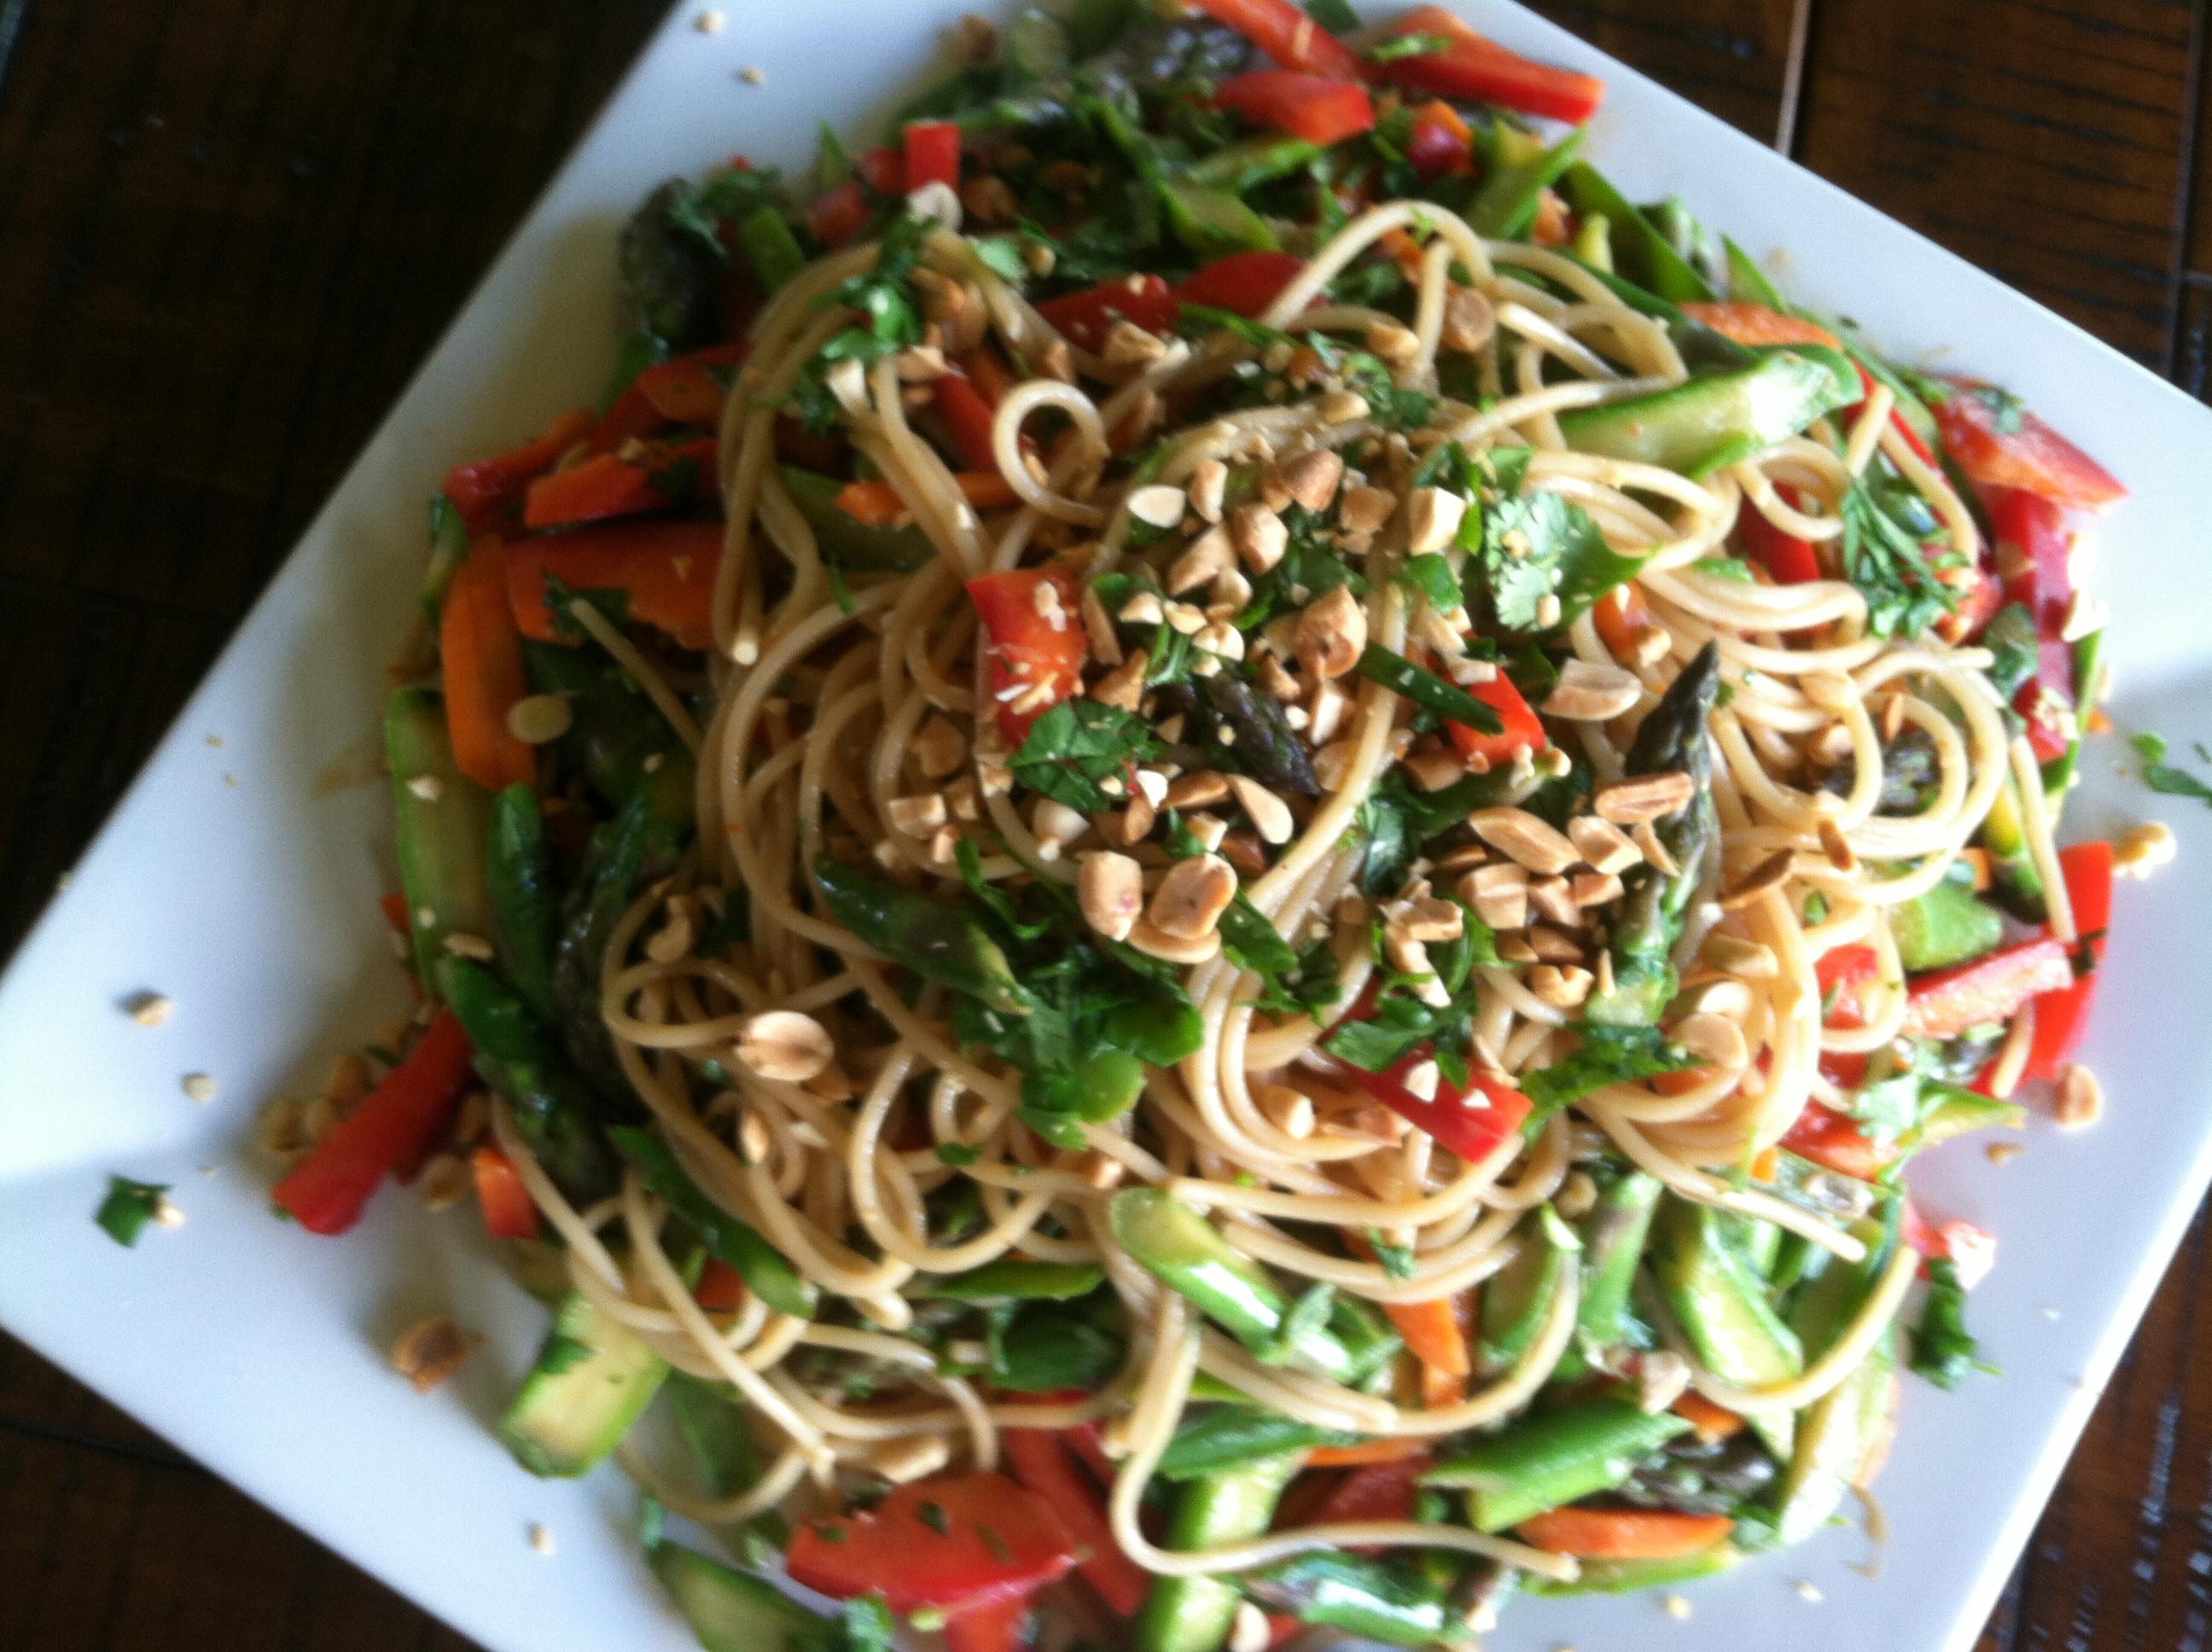 Vegetable Main Dishes  Main Dish Salads Peanut Noodle Ve able Salad Gluten